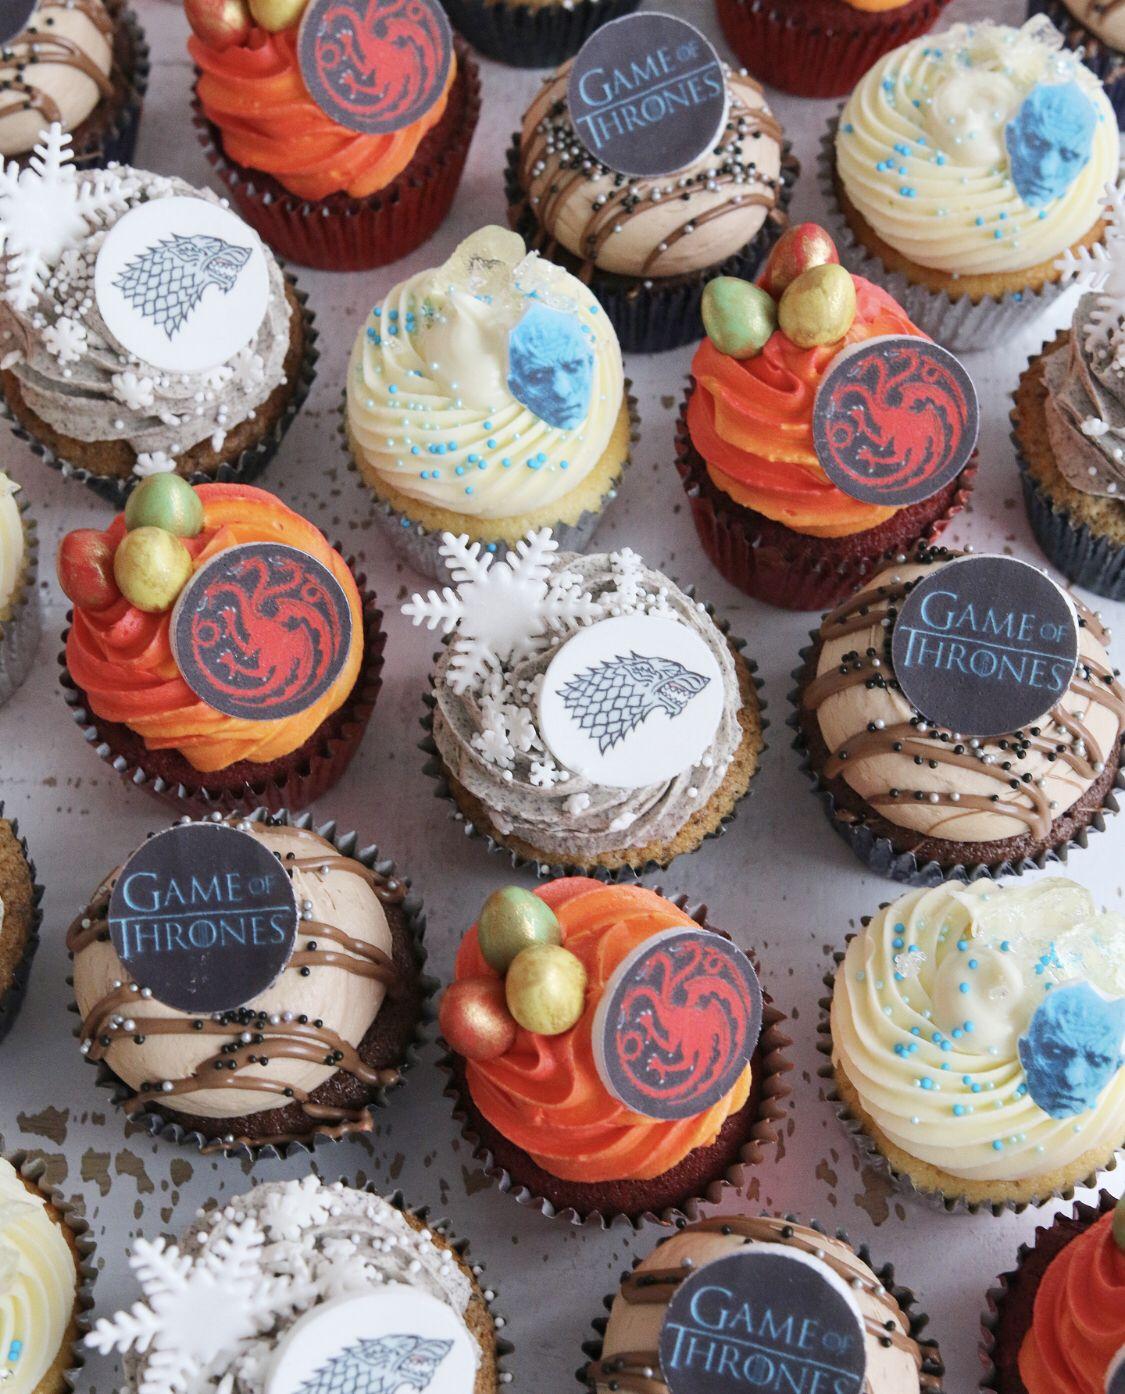 Bespoke Cupcakes In 2020 School Treats Cupcakes Treats